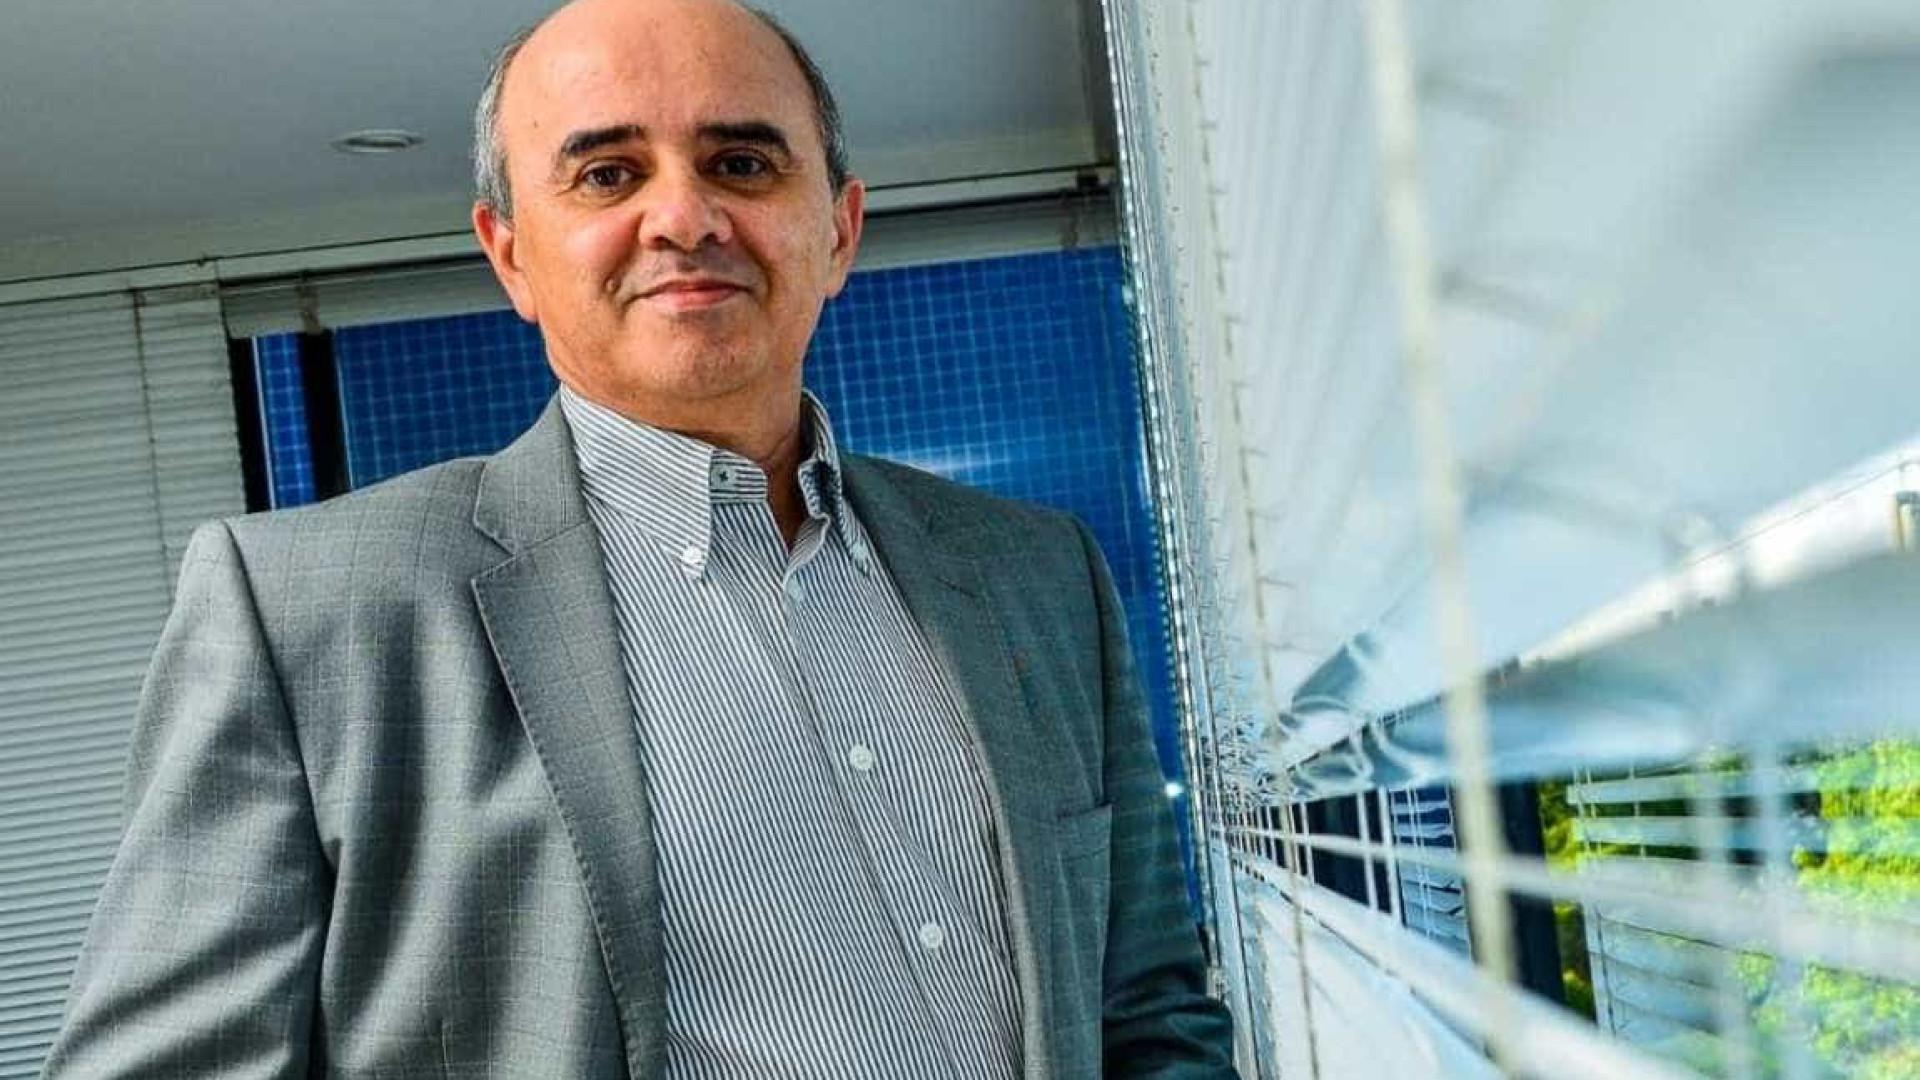 Número 2 da PGR responde Janot sobre Alckmin fora da Lava Jato